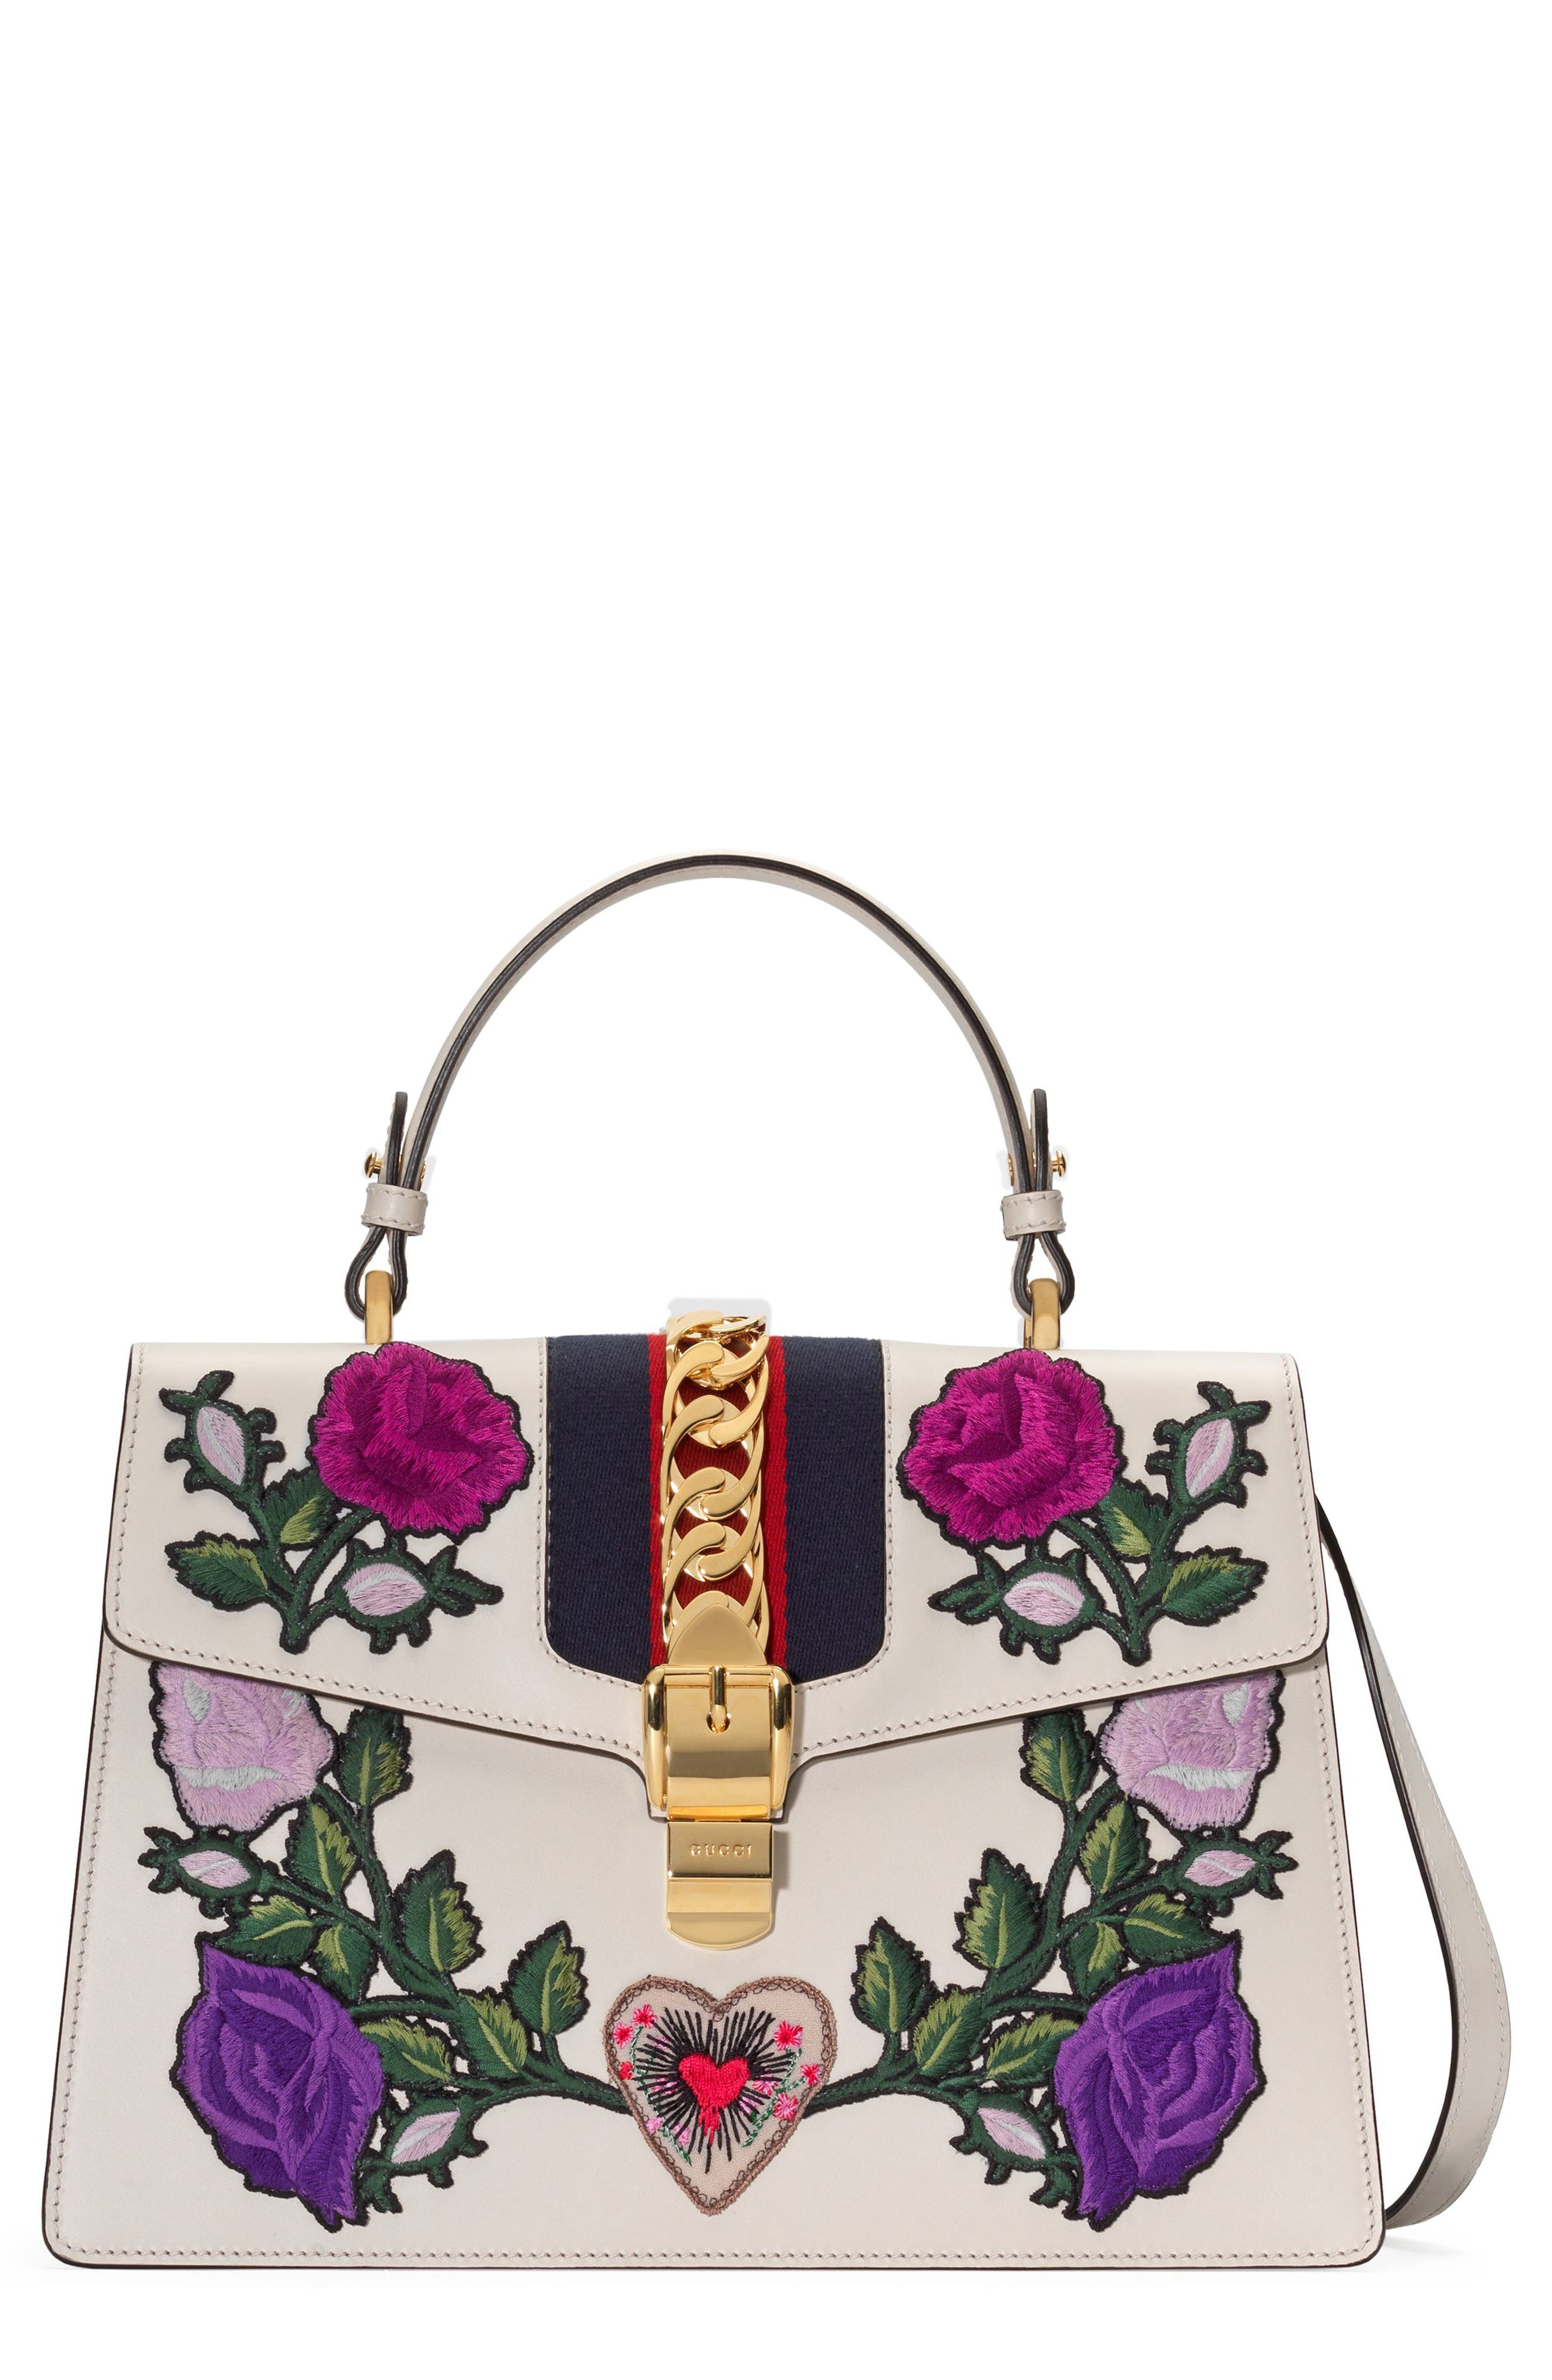 Alternate Image 1 Selected - Gucci Medium Sylvie Floral Patch Top Handle Leather Shoulder Bag